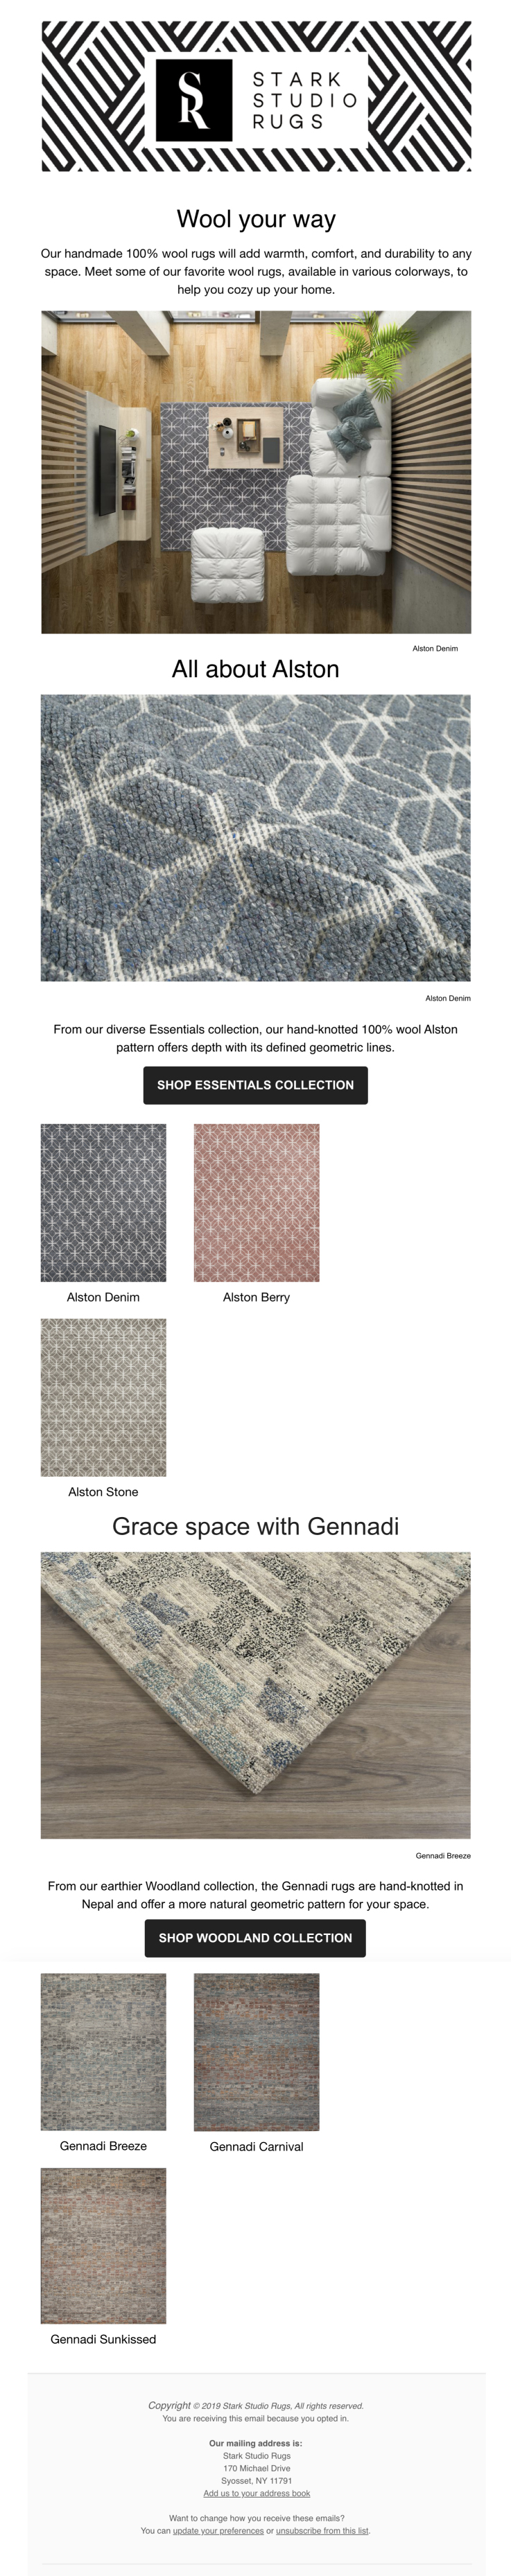 Stark Studio Rug Post | Wool your way: choose your color!